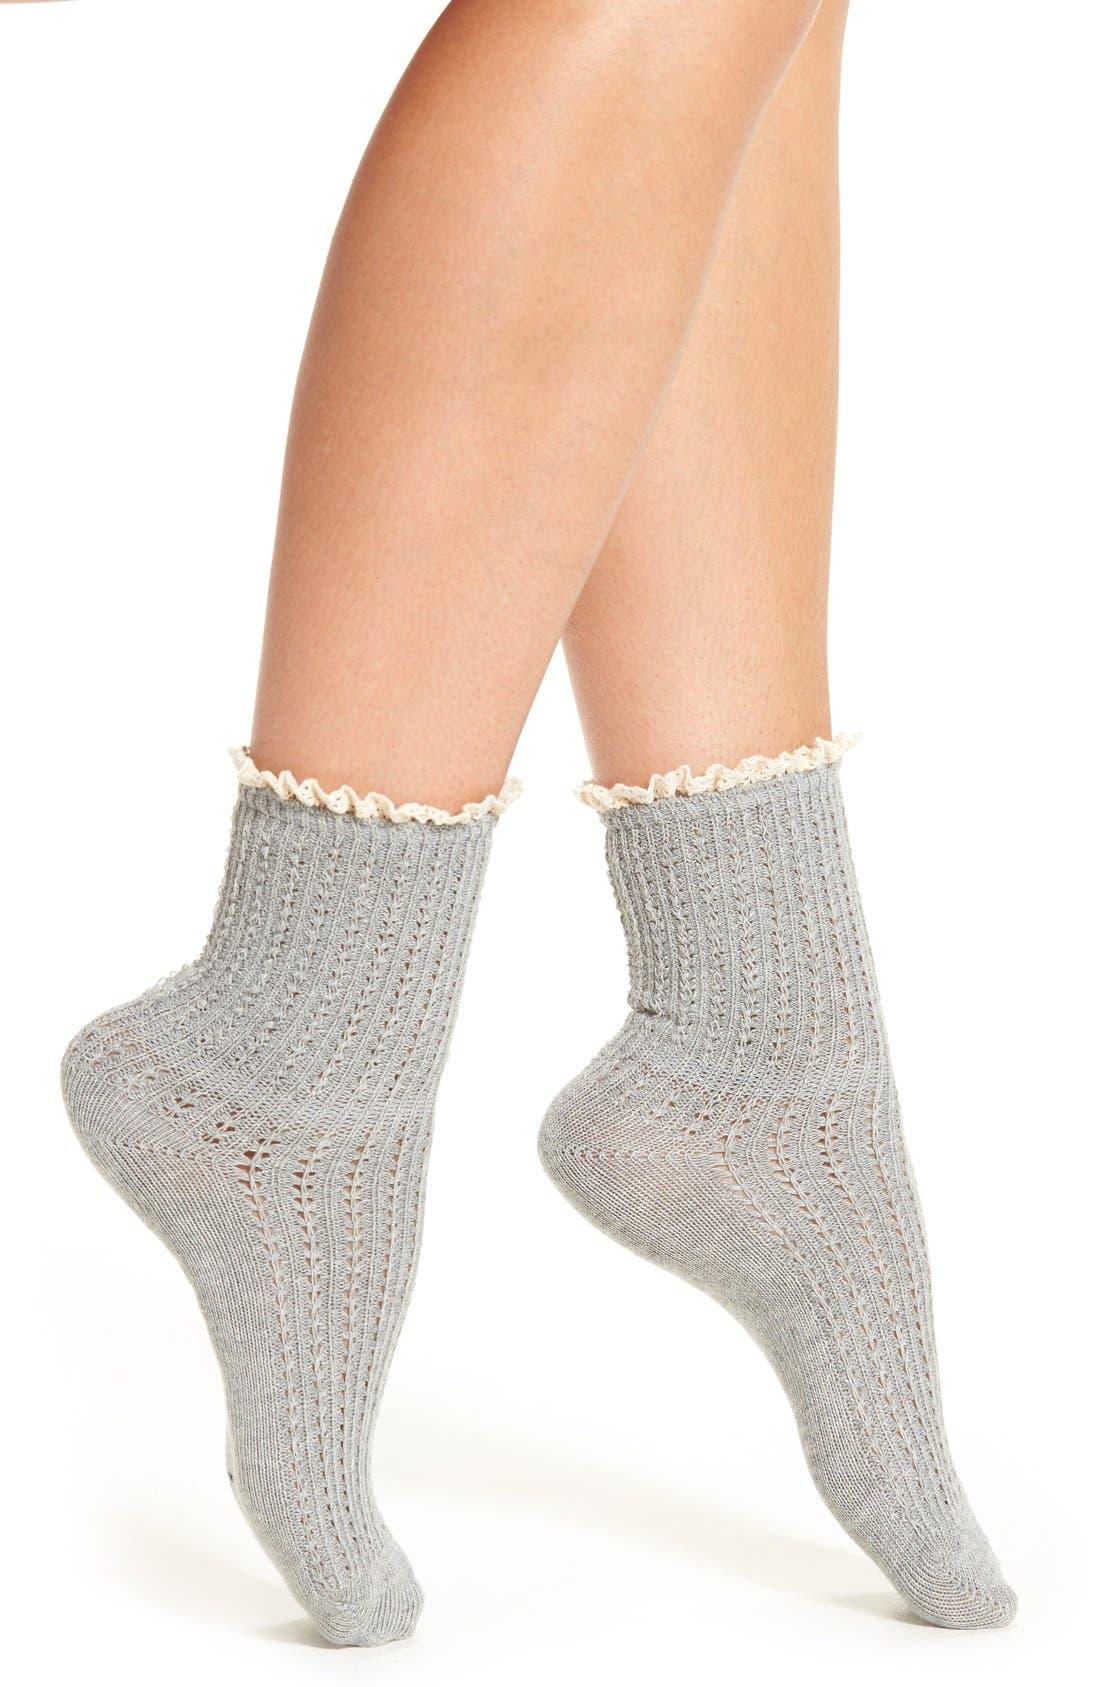 Main Image - Peony & Moss Lace TrimCrew Socks